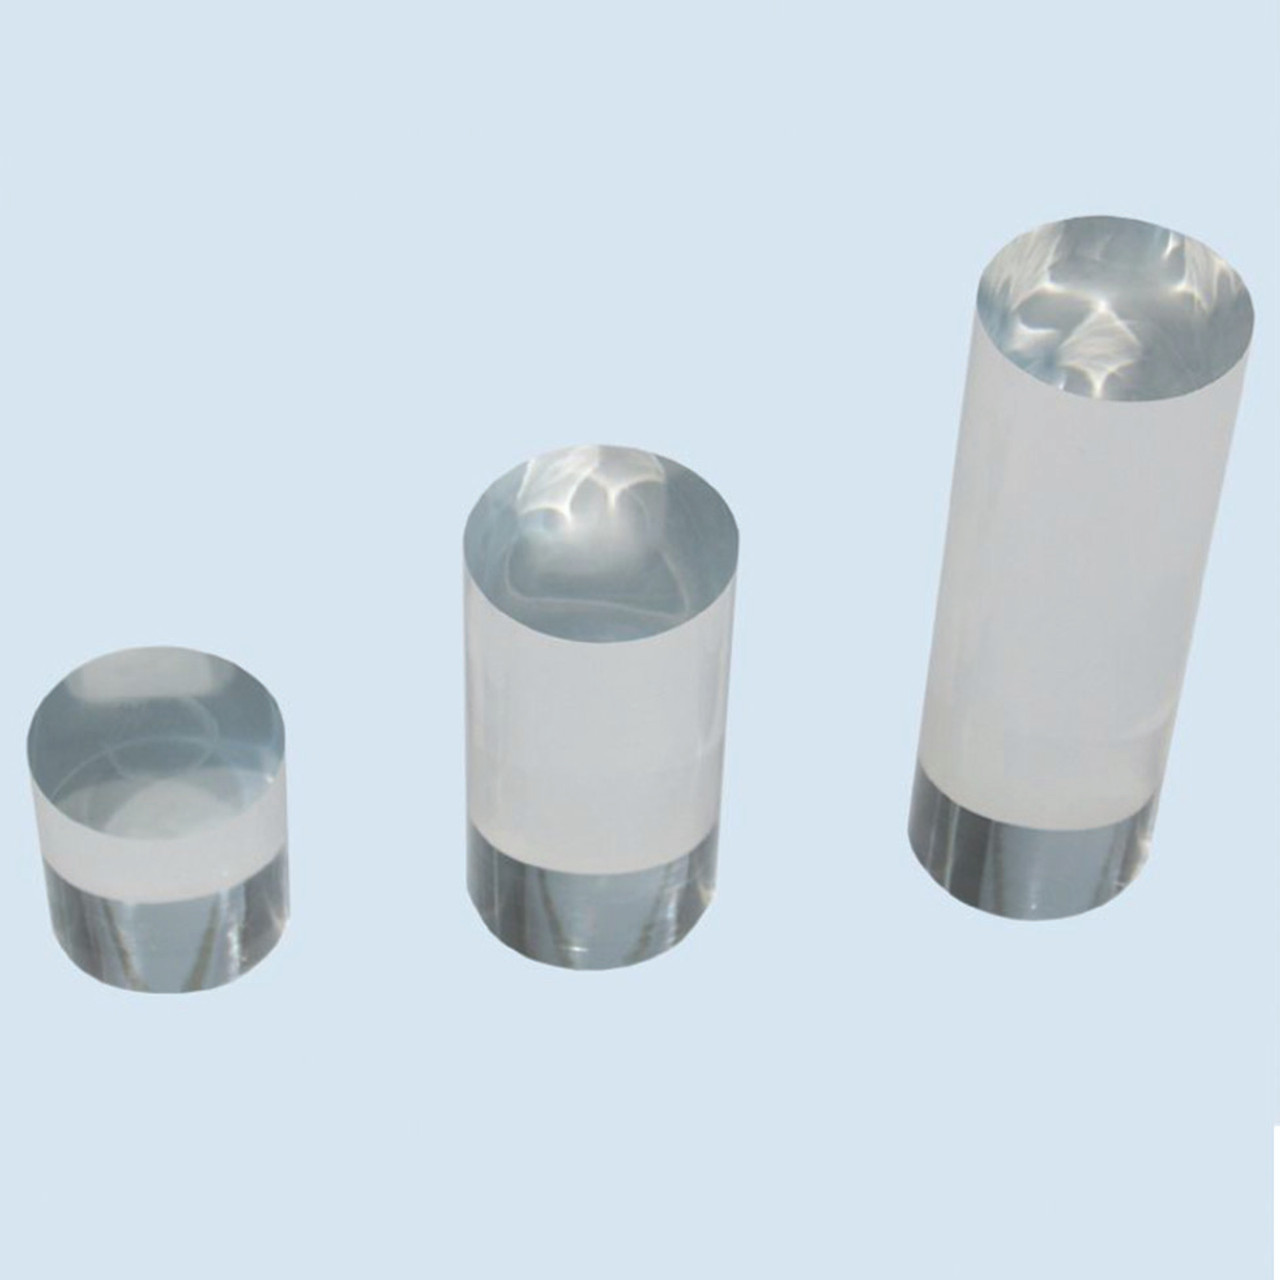 Solid Acrylic Cylinder Set (Plexi)